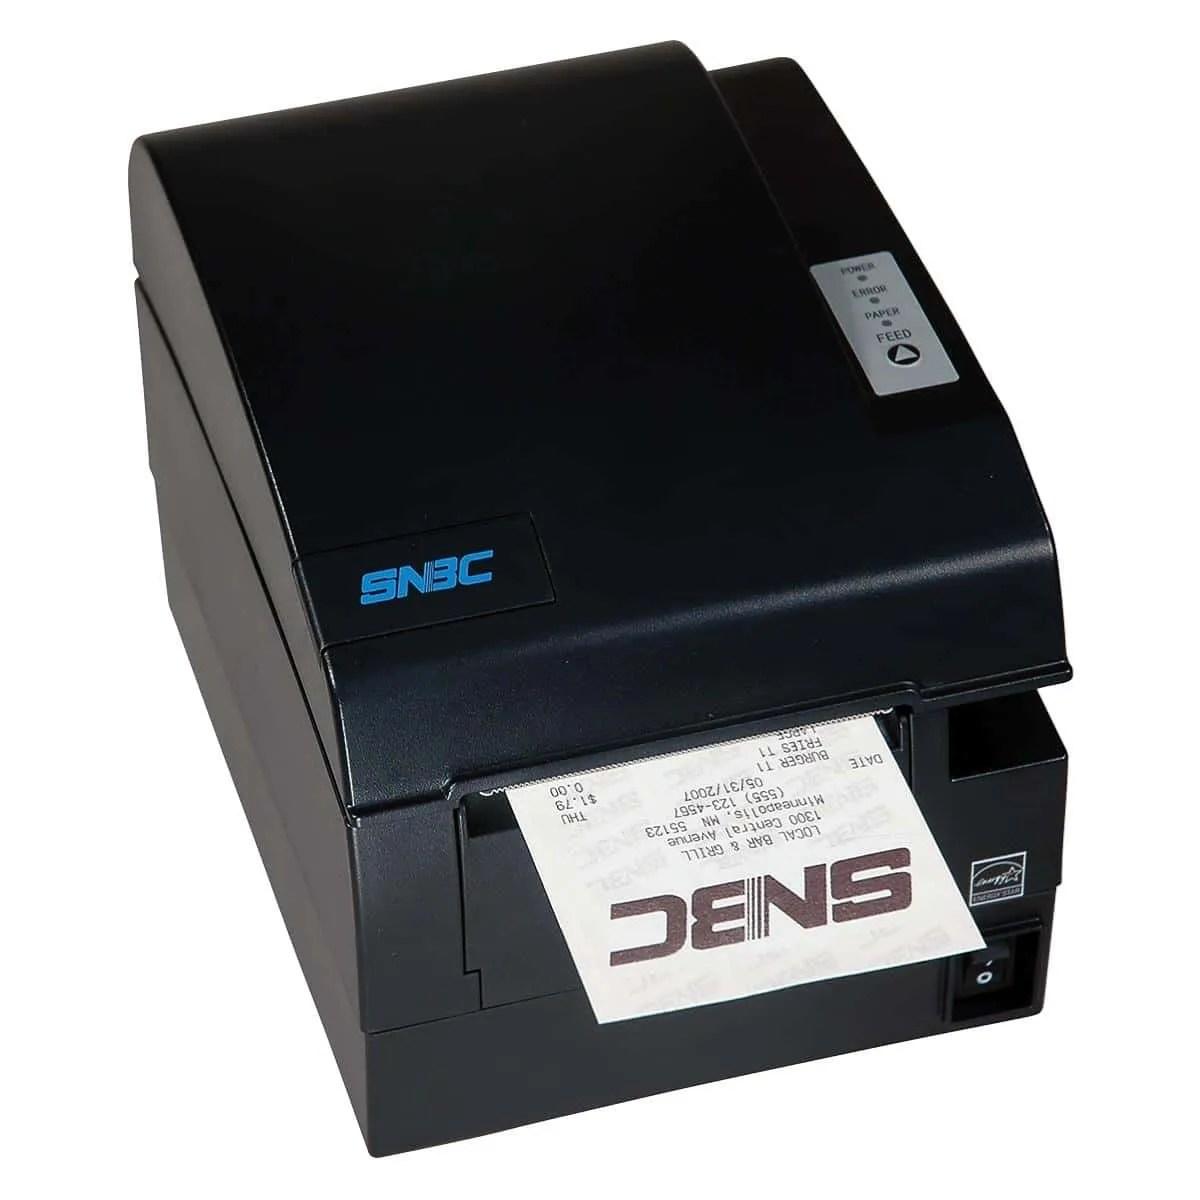 SNBC Printer BTP-R580II Black USB Only| JaimePOS A Leading POS & Merchant Services Provider